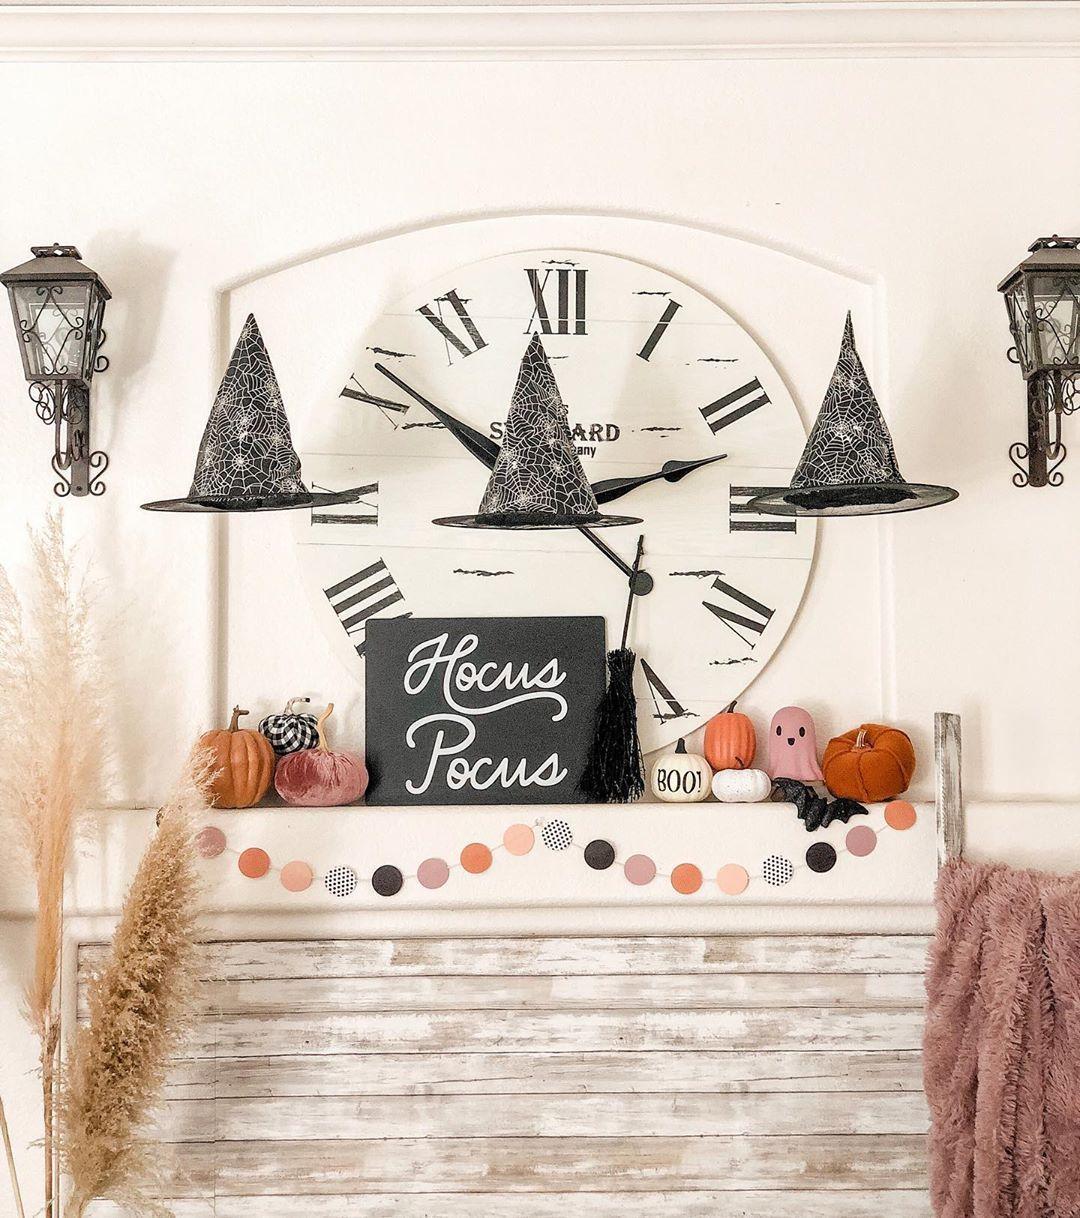 Annette On Instagram It S Just A Bunch Of Hocus Pocus Halloweendecor Halloweenmantle Fall Halloween Decor Halloween Bedroom Vintage Holiday Decor